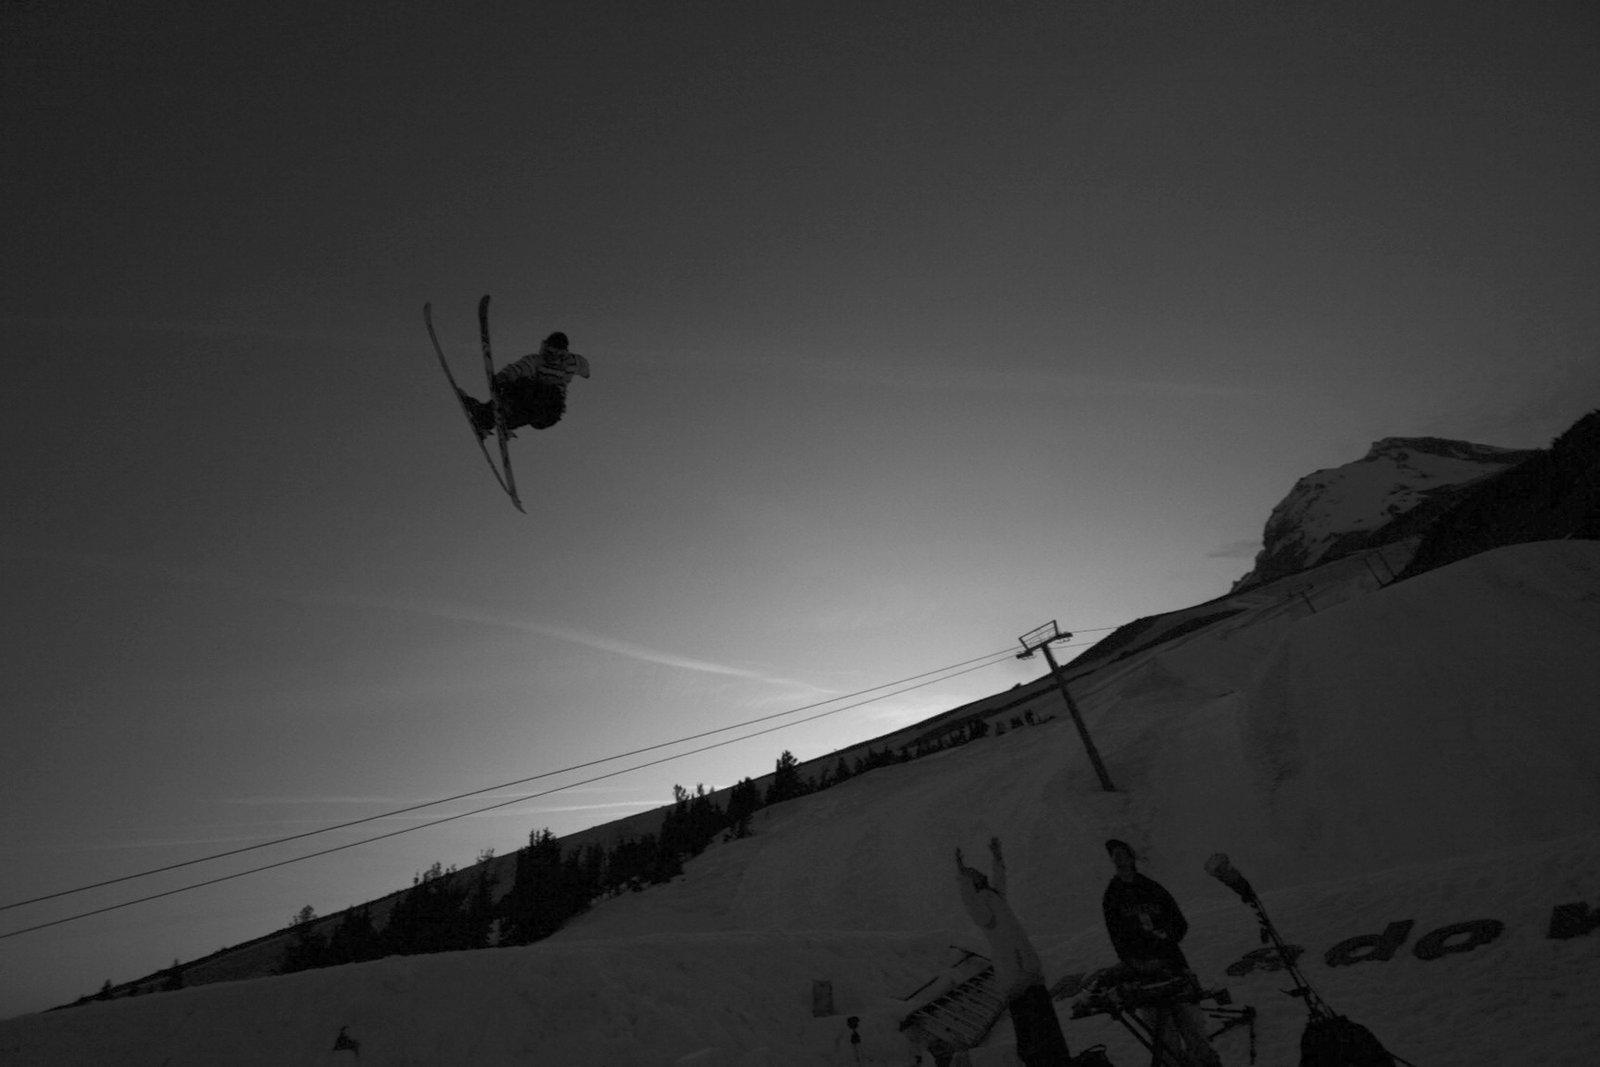 Andy Mahre 180 Mt Hood Meadows